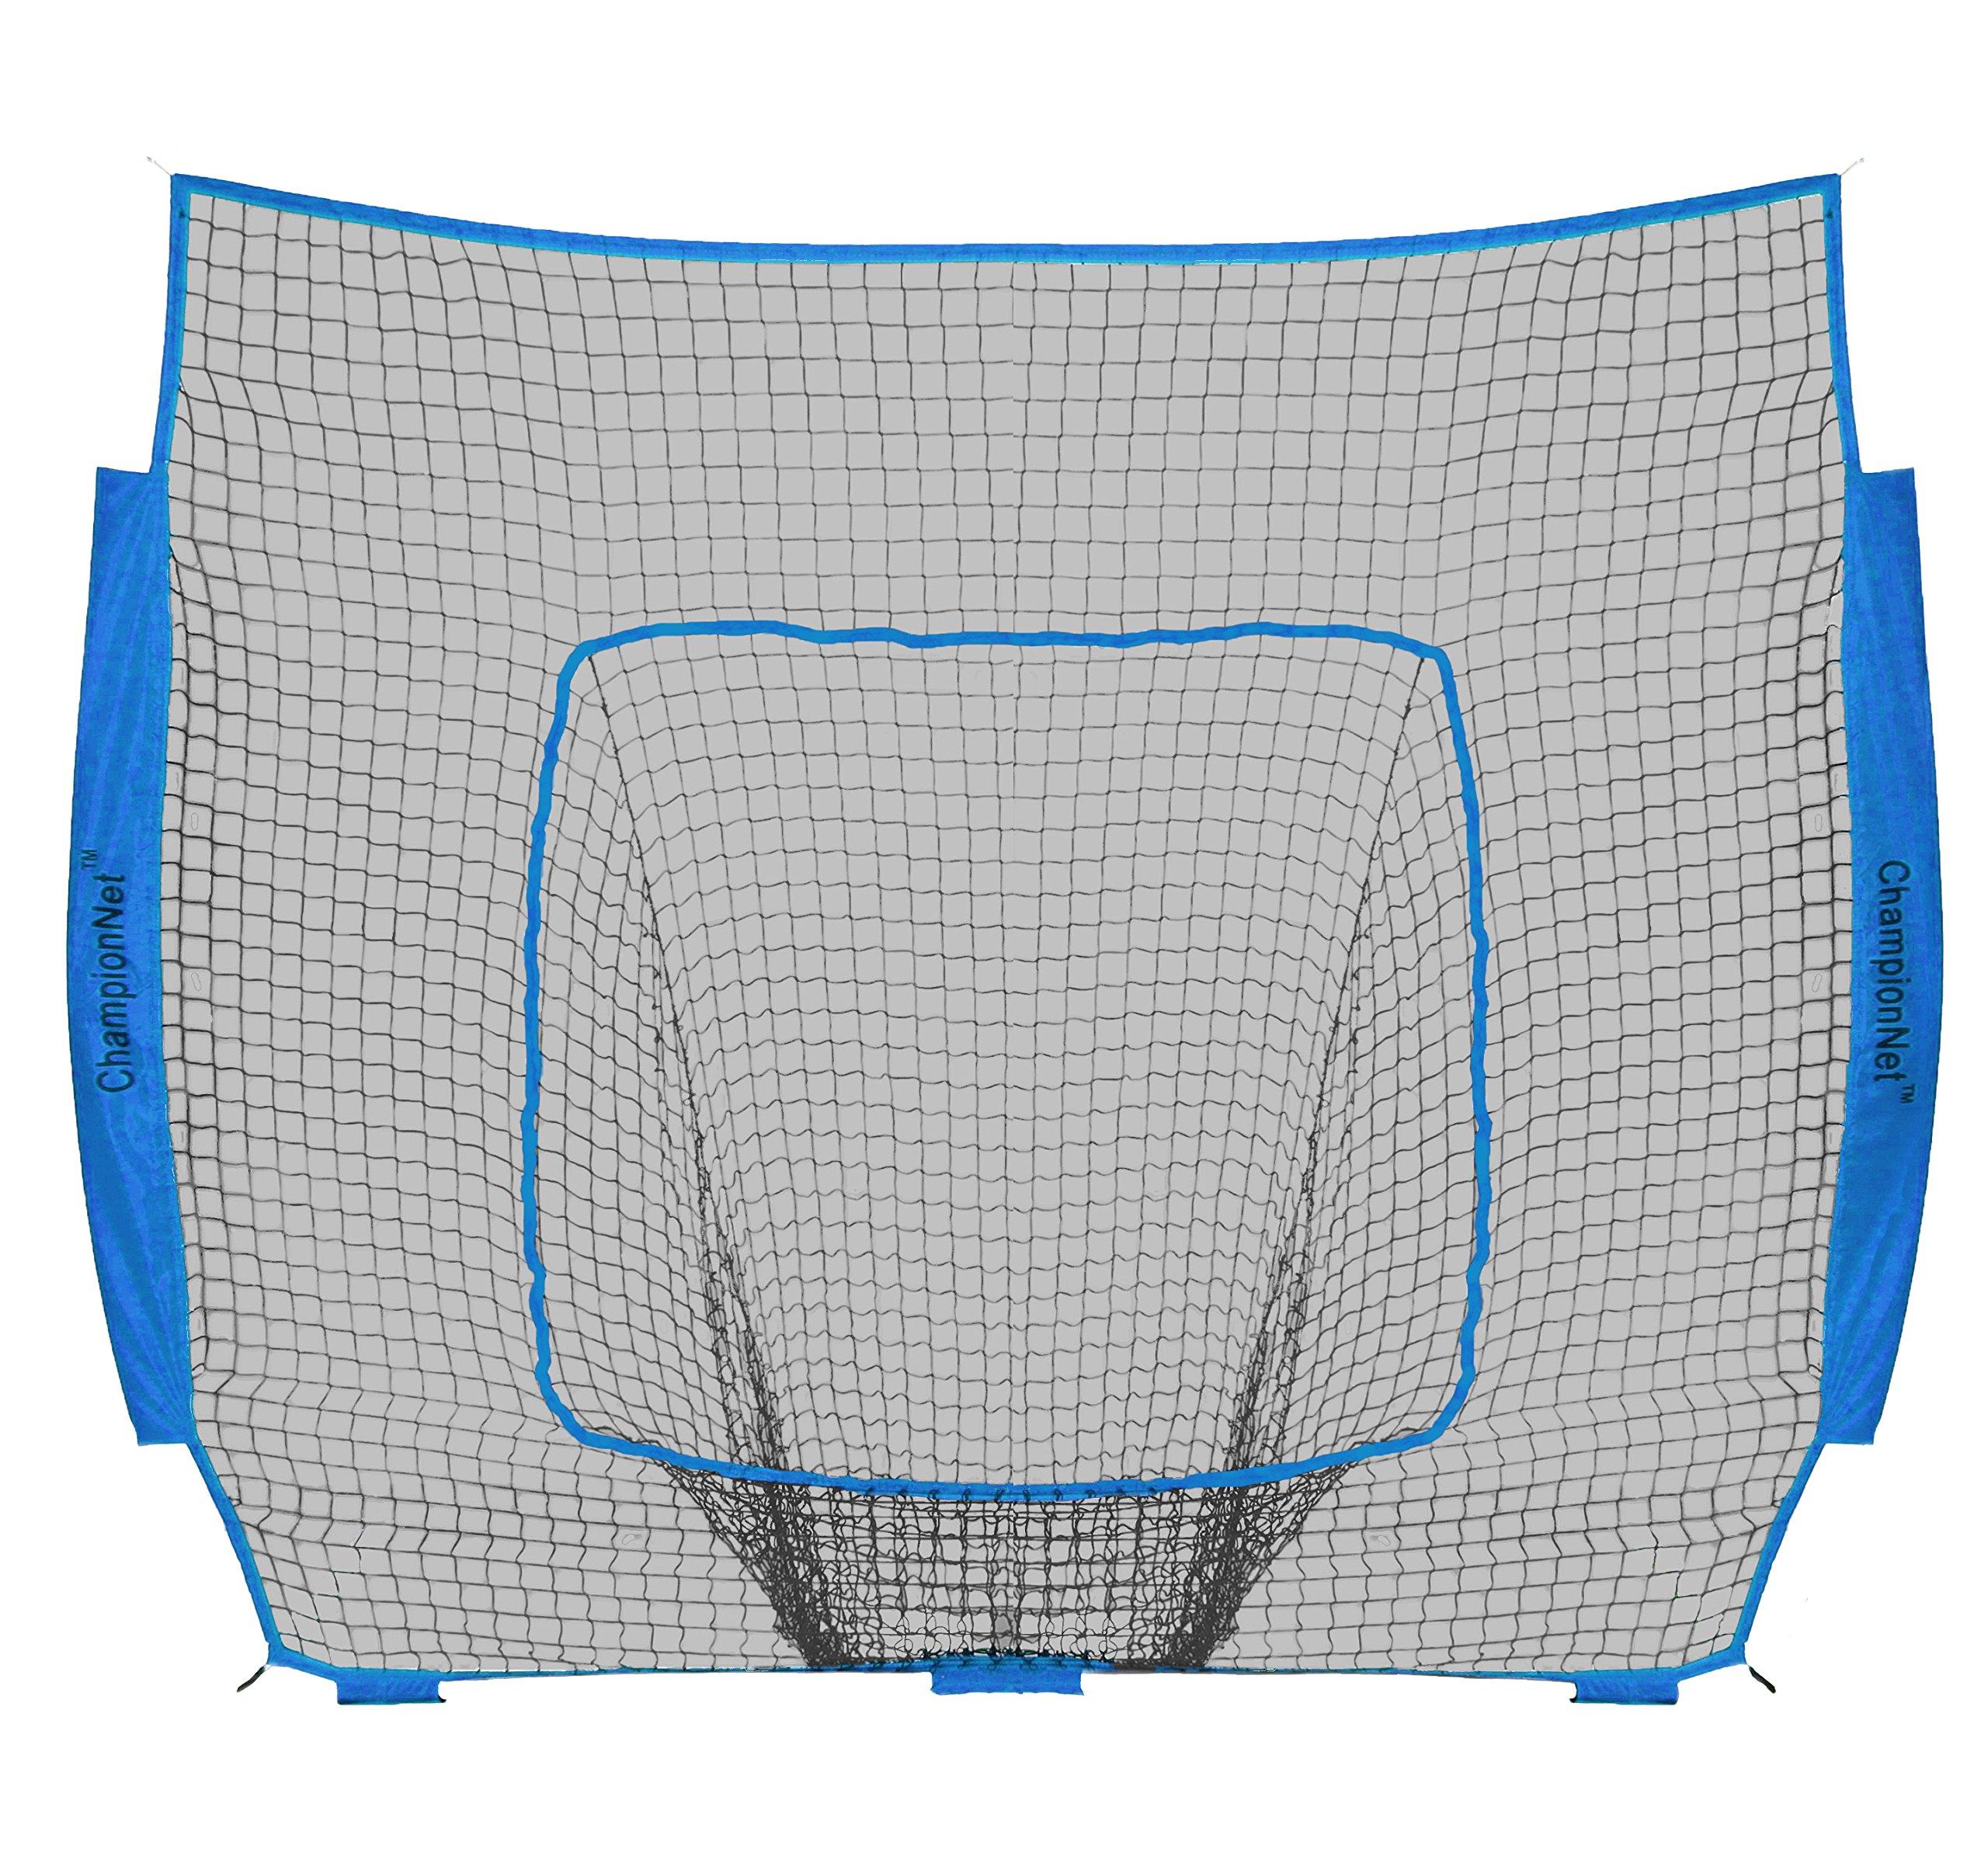 ChampionNet Baseball/Softball 7' x 7' Hitting Net Replacement NO Frame -Sky Blue by ChampionNet